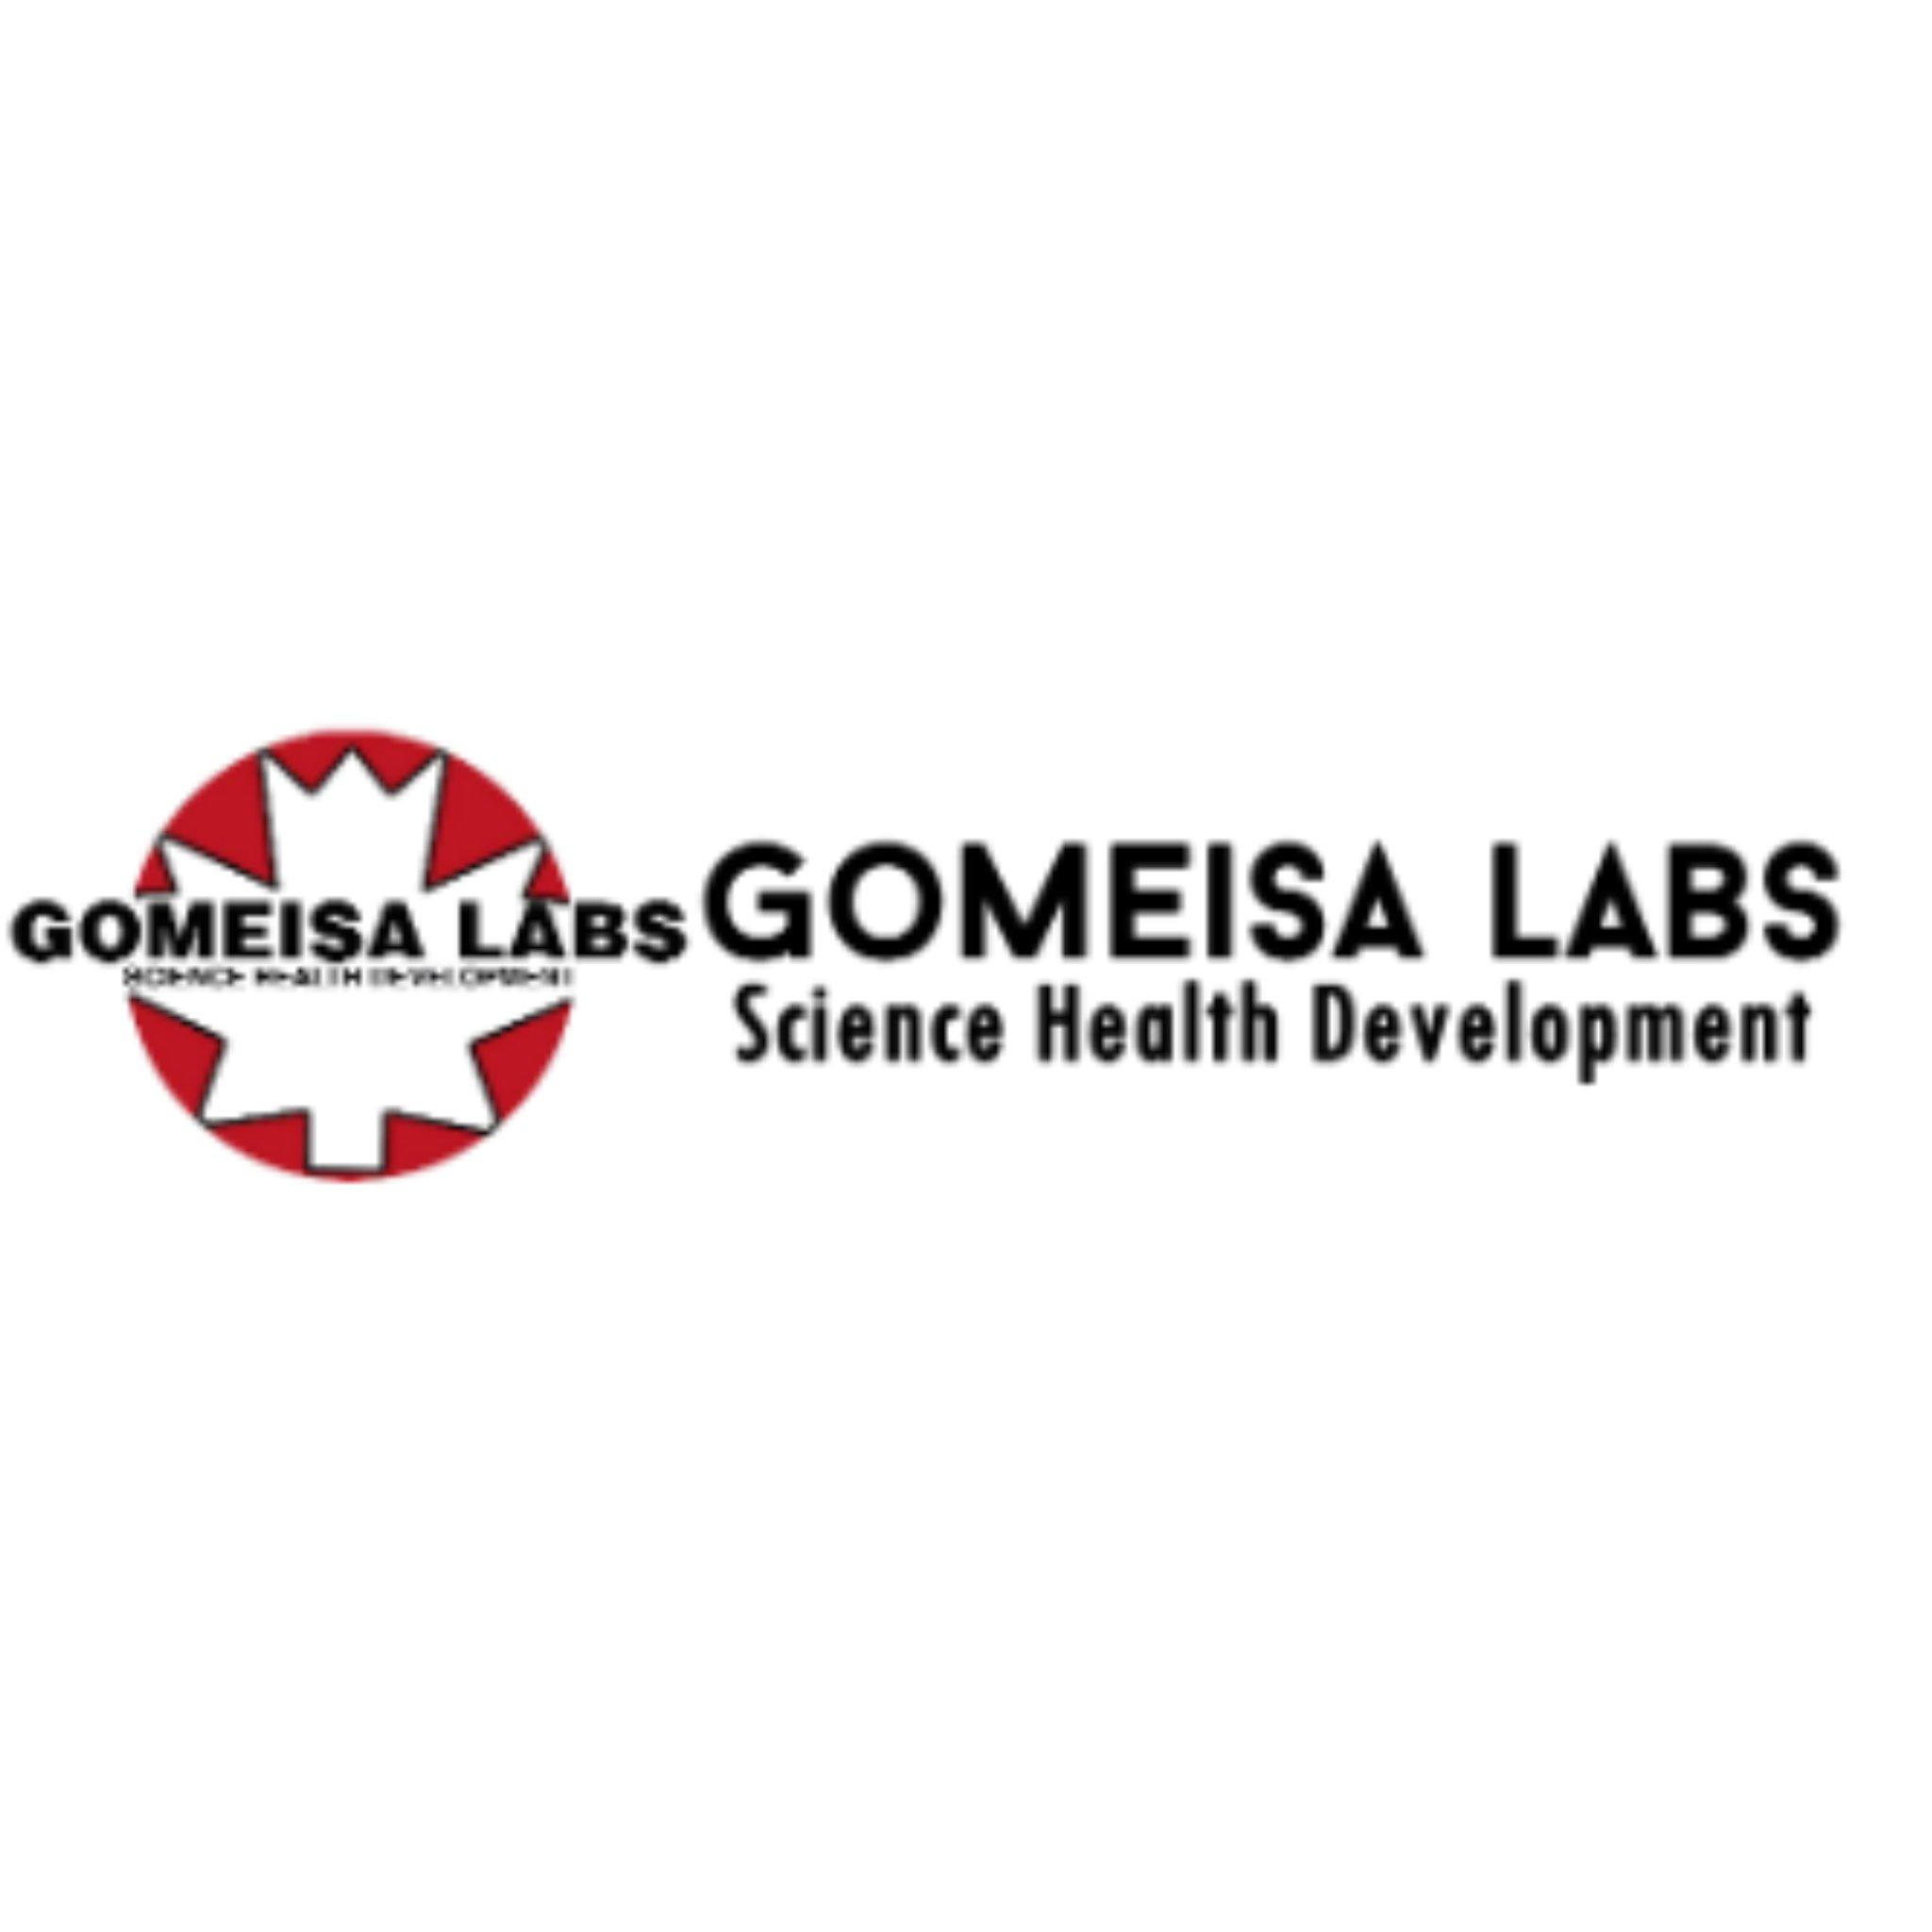 gomeisa_labs on Twitter: